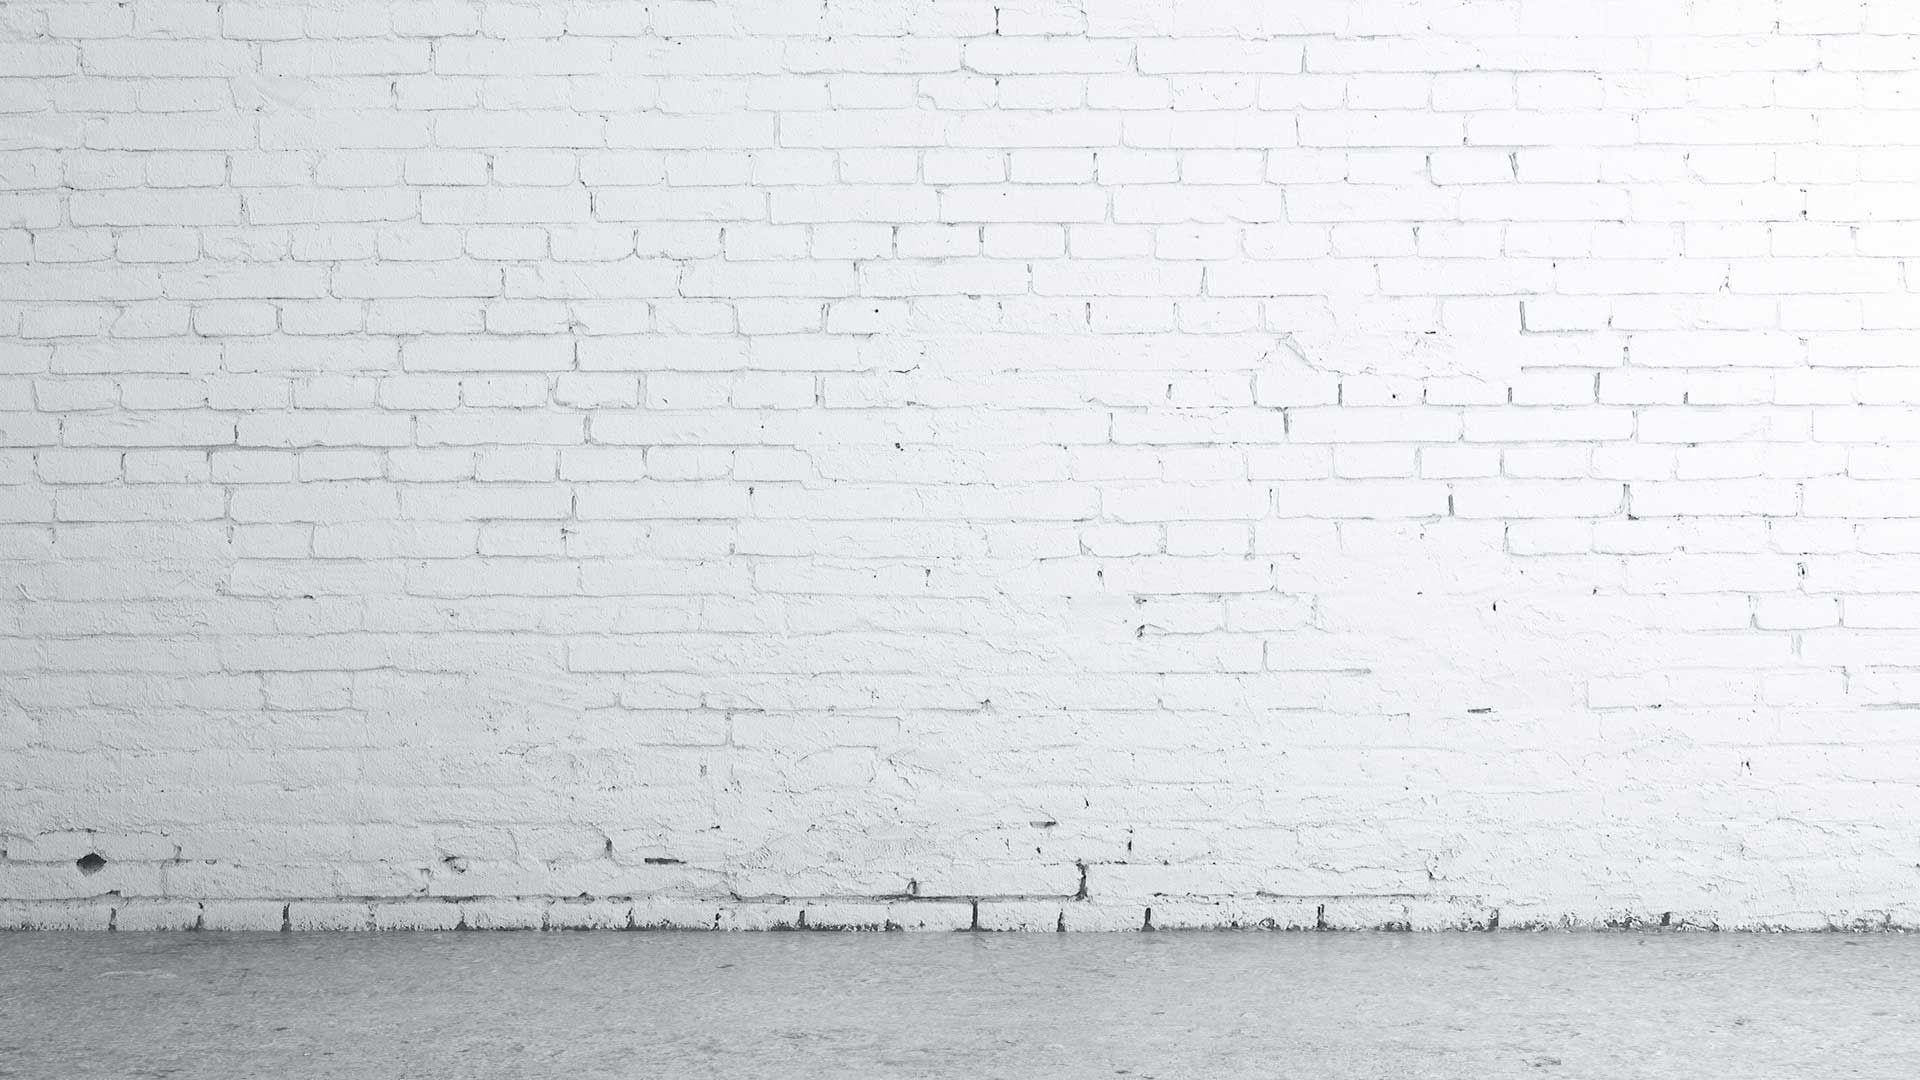 White Brick Wall White Brick Wall 1080p Wallpaper Hdwallpape 1080p Brick Hdwallpape Wall In 2020 White Brick Walls White Brick Wallpaper Brick Wallpaper Hd